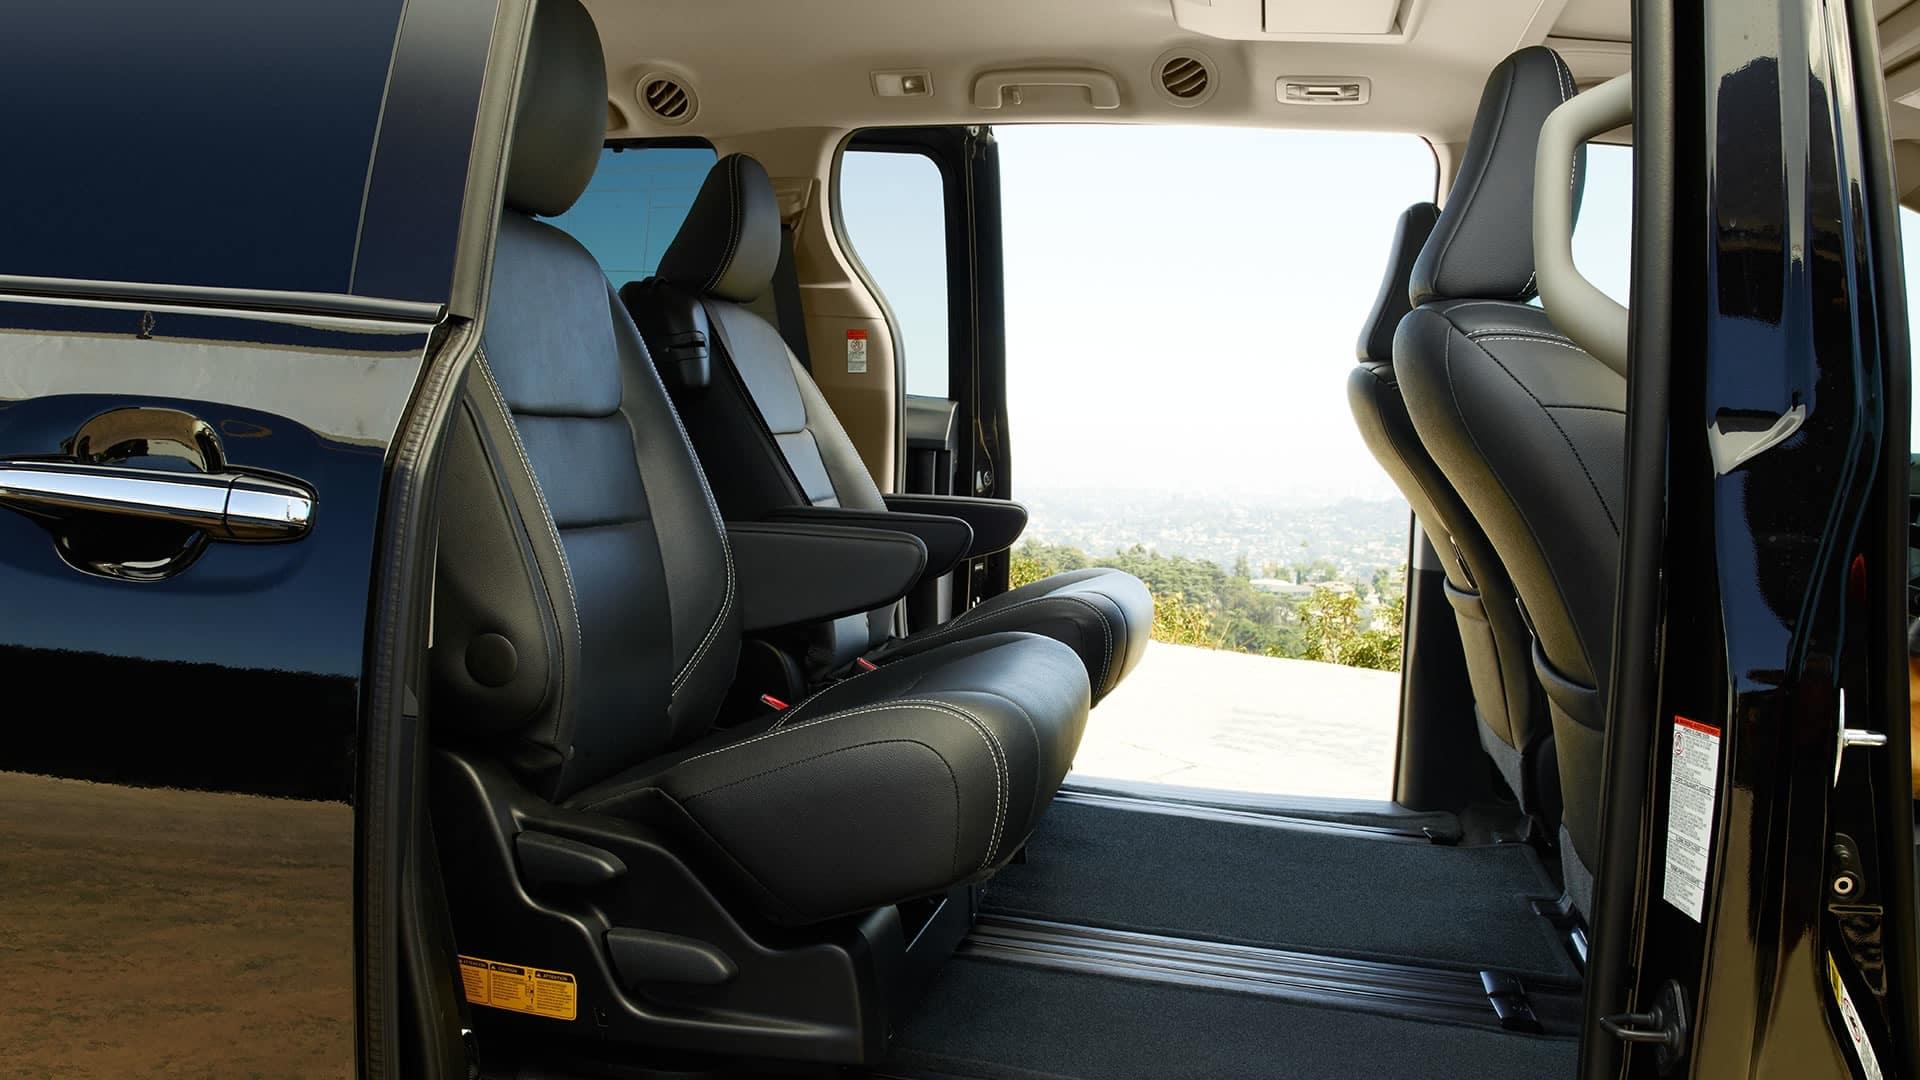 2017 Toyota Sienna SE Premium Interior Seating Black wtih White Accent Stitching